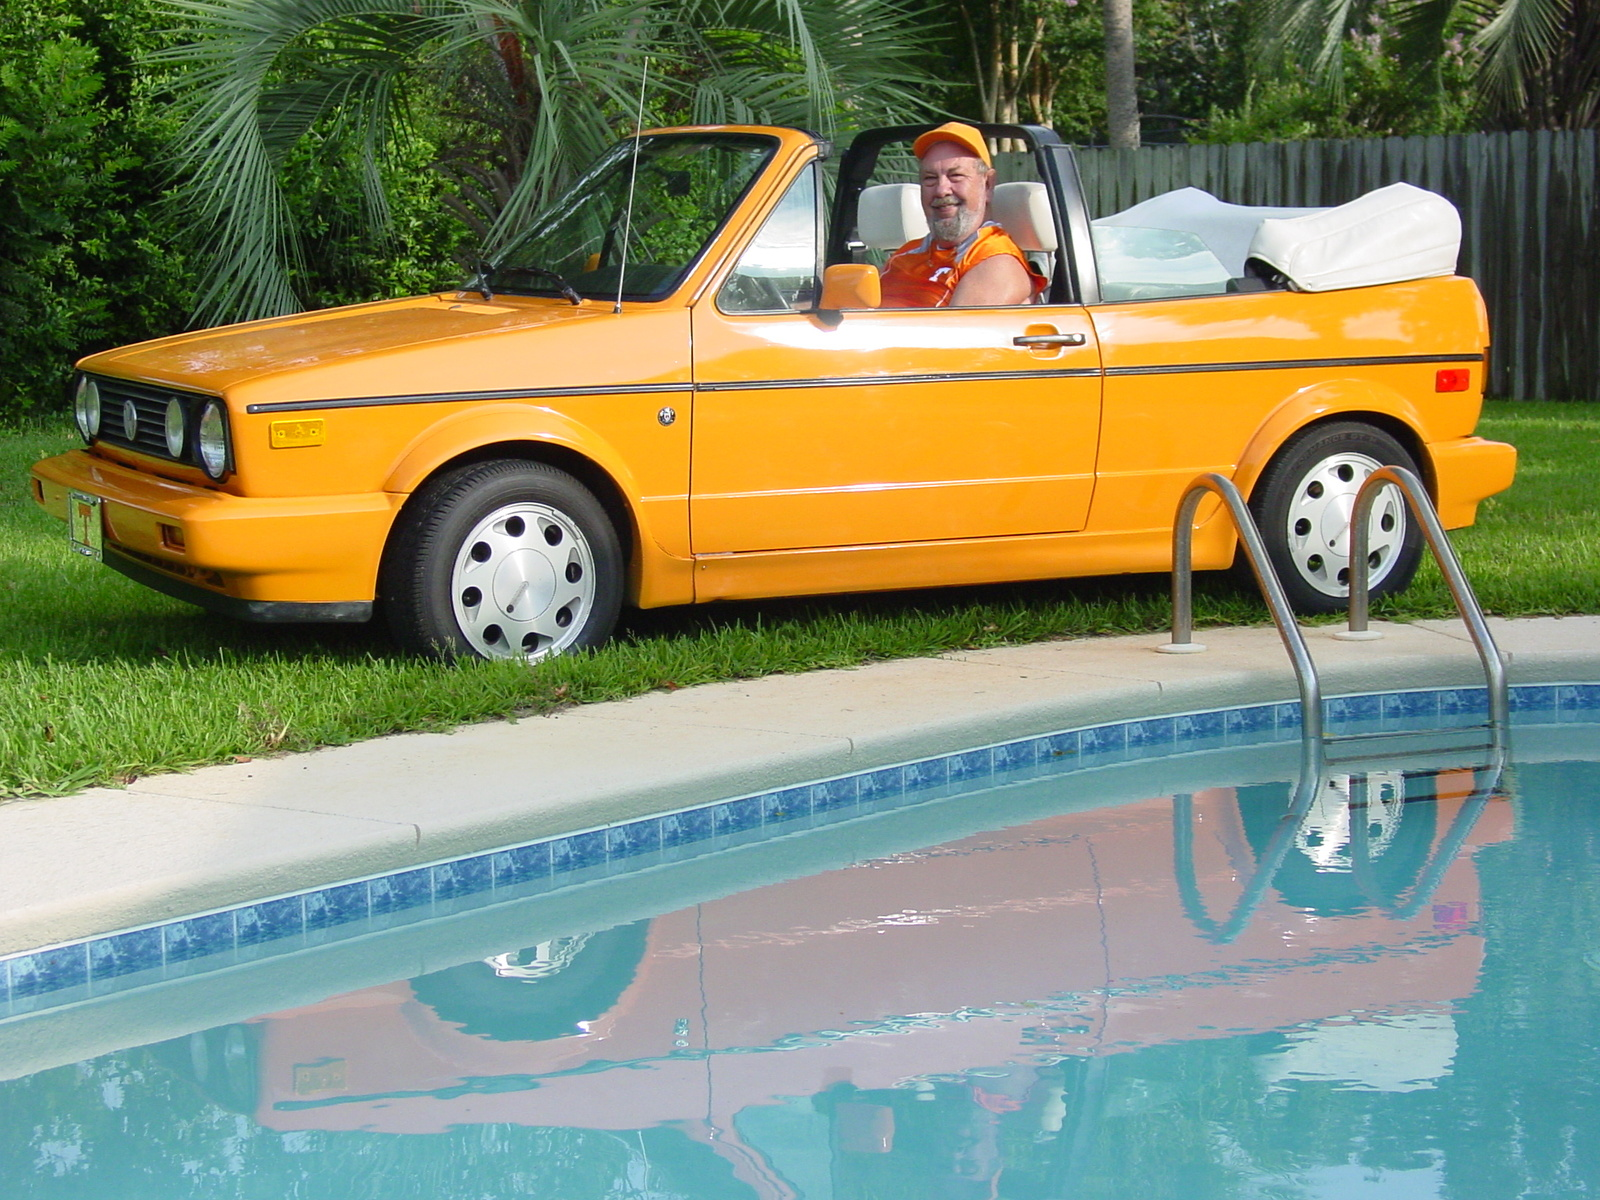 1992 Volkswagen Cabriolet